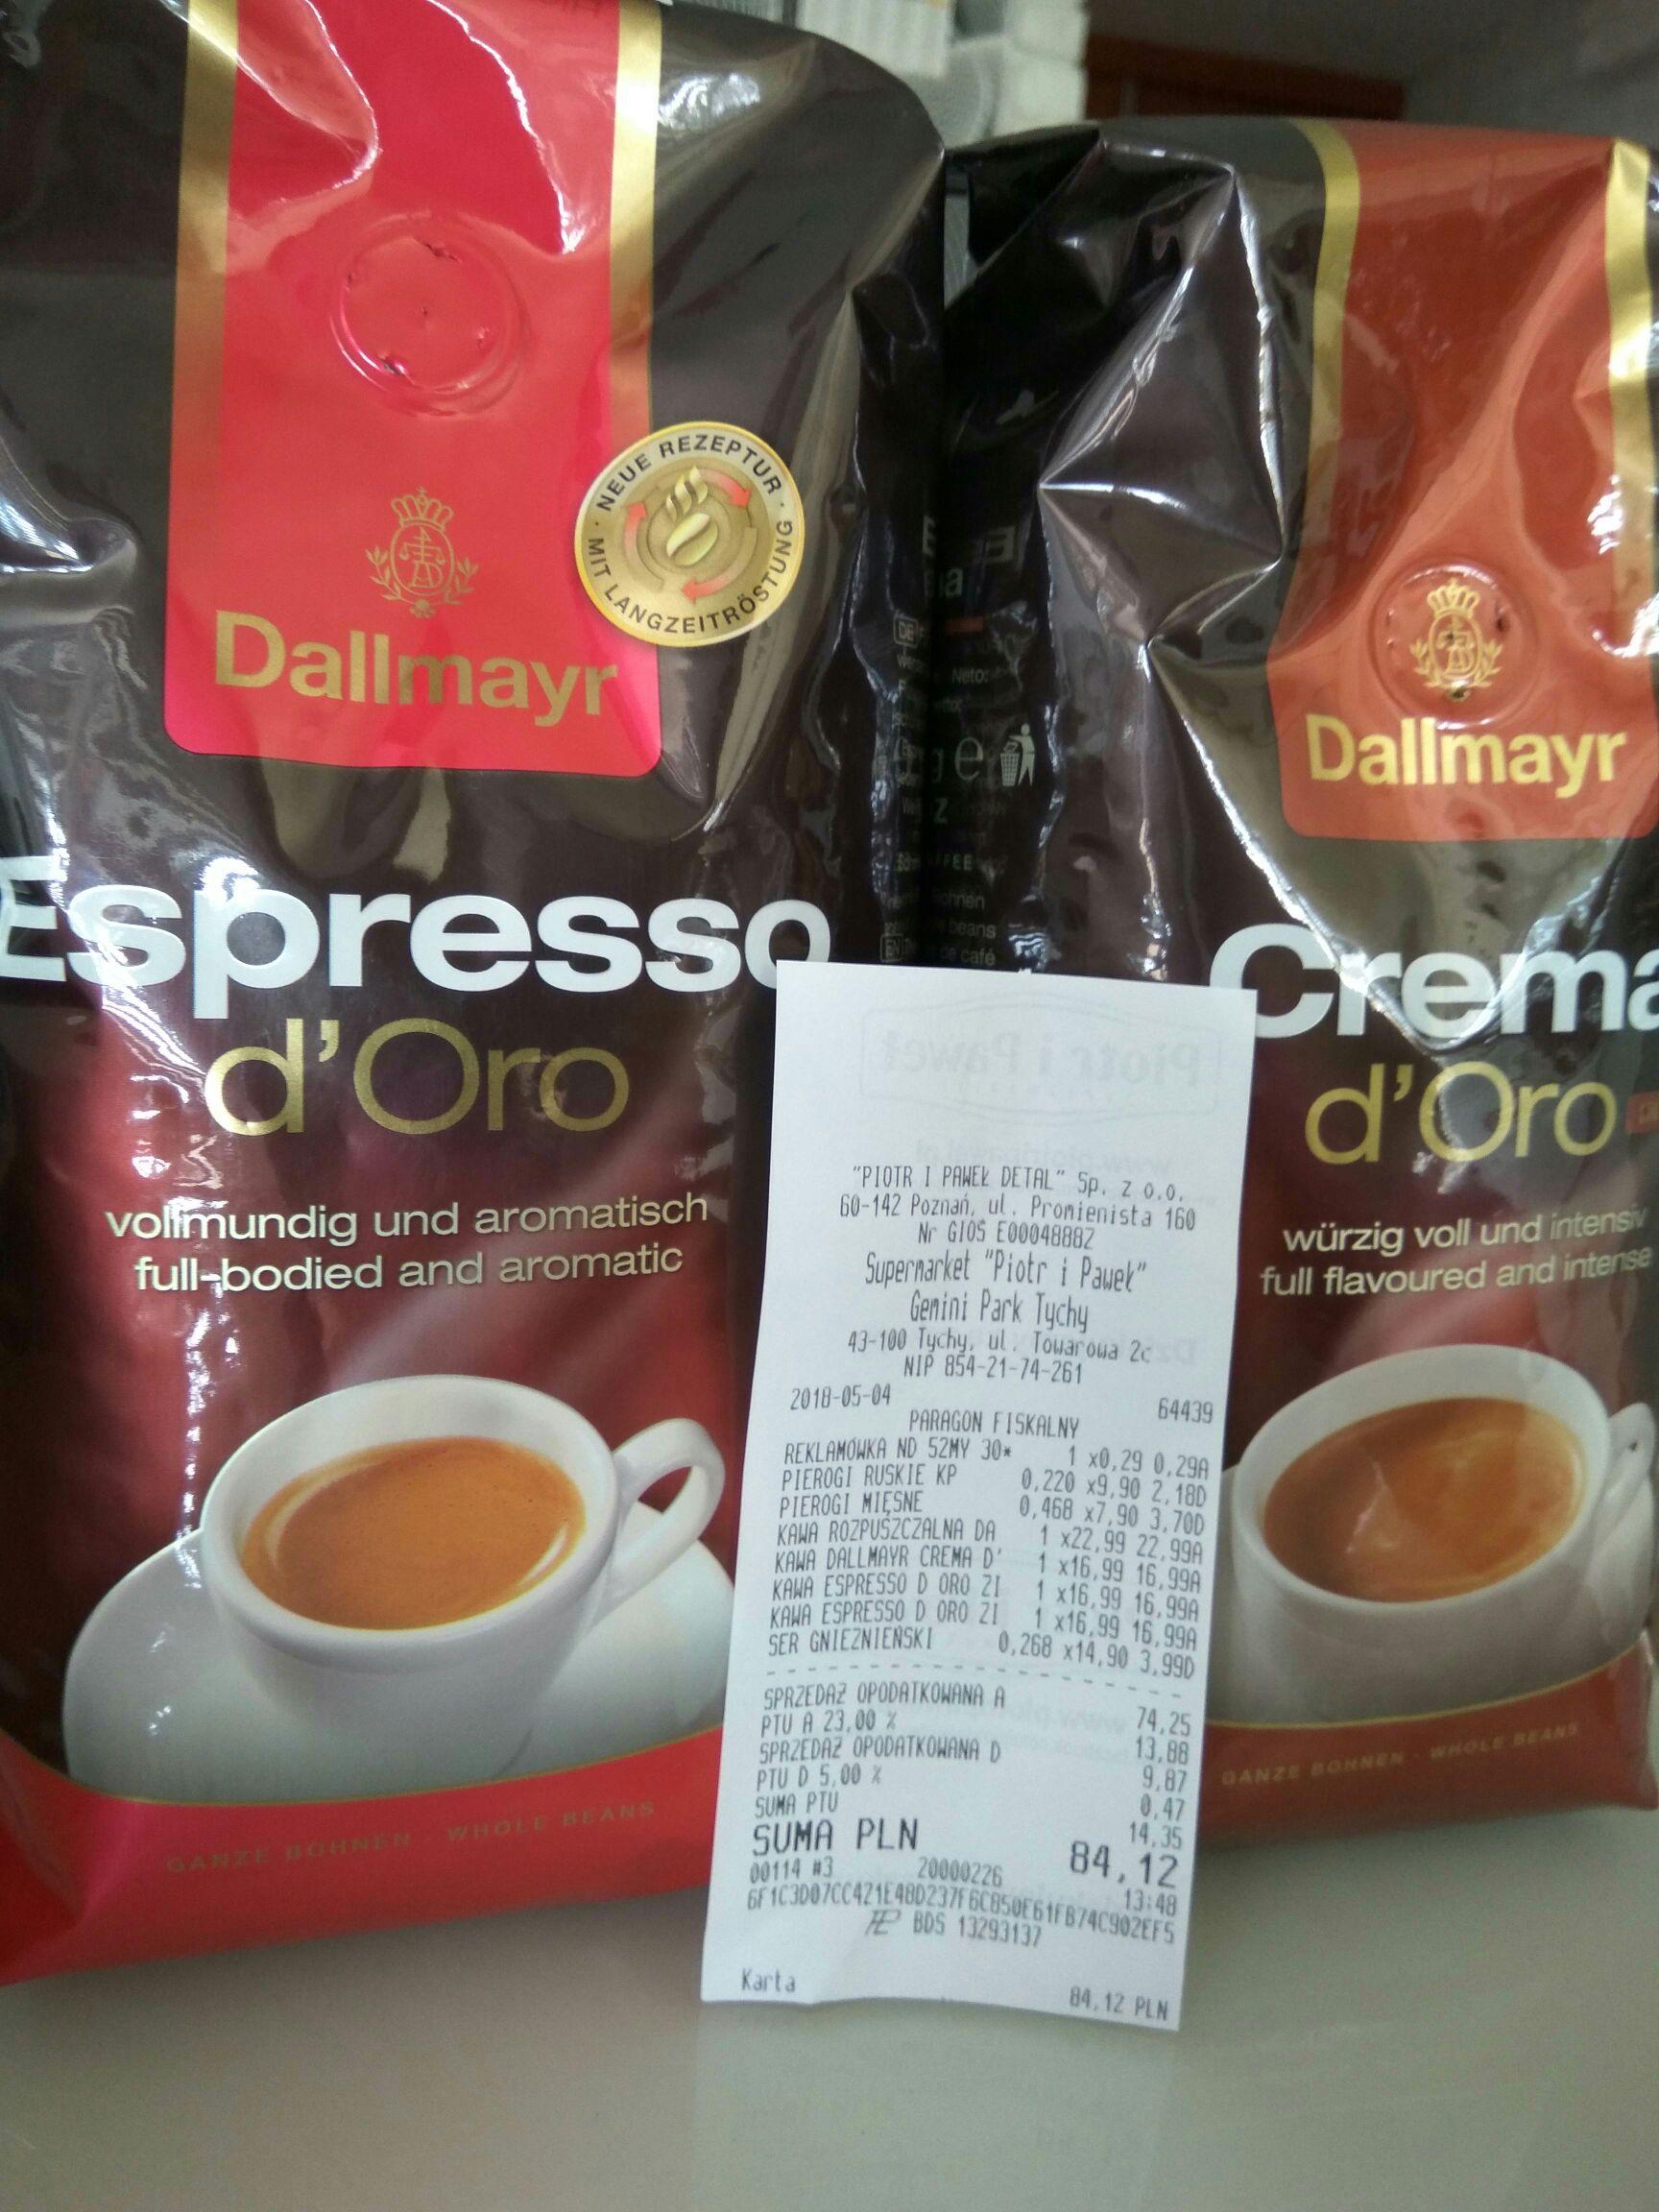 Kawa ziarnista Dallmayr Espresso d'oro 500g i Crema d'oro Intensa 500g / Piotr i Paweł Gemini Park Tychy